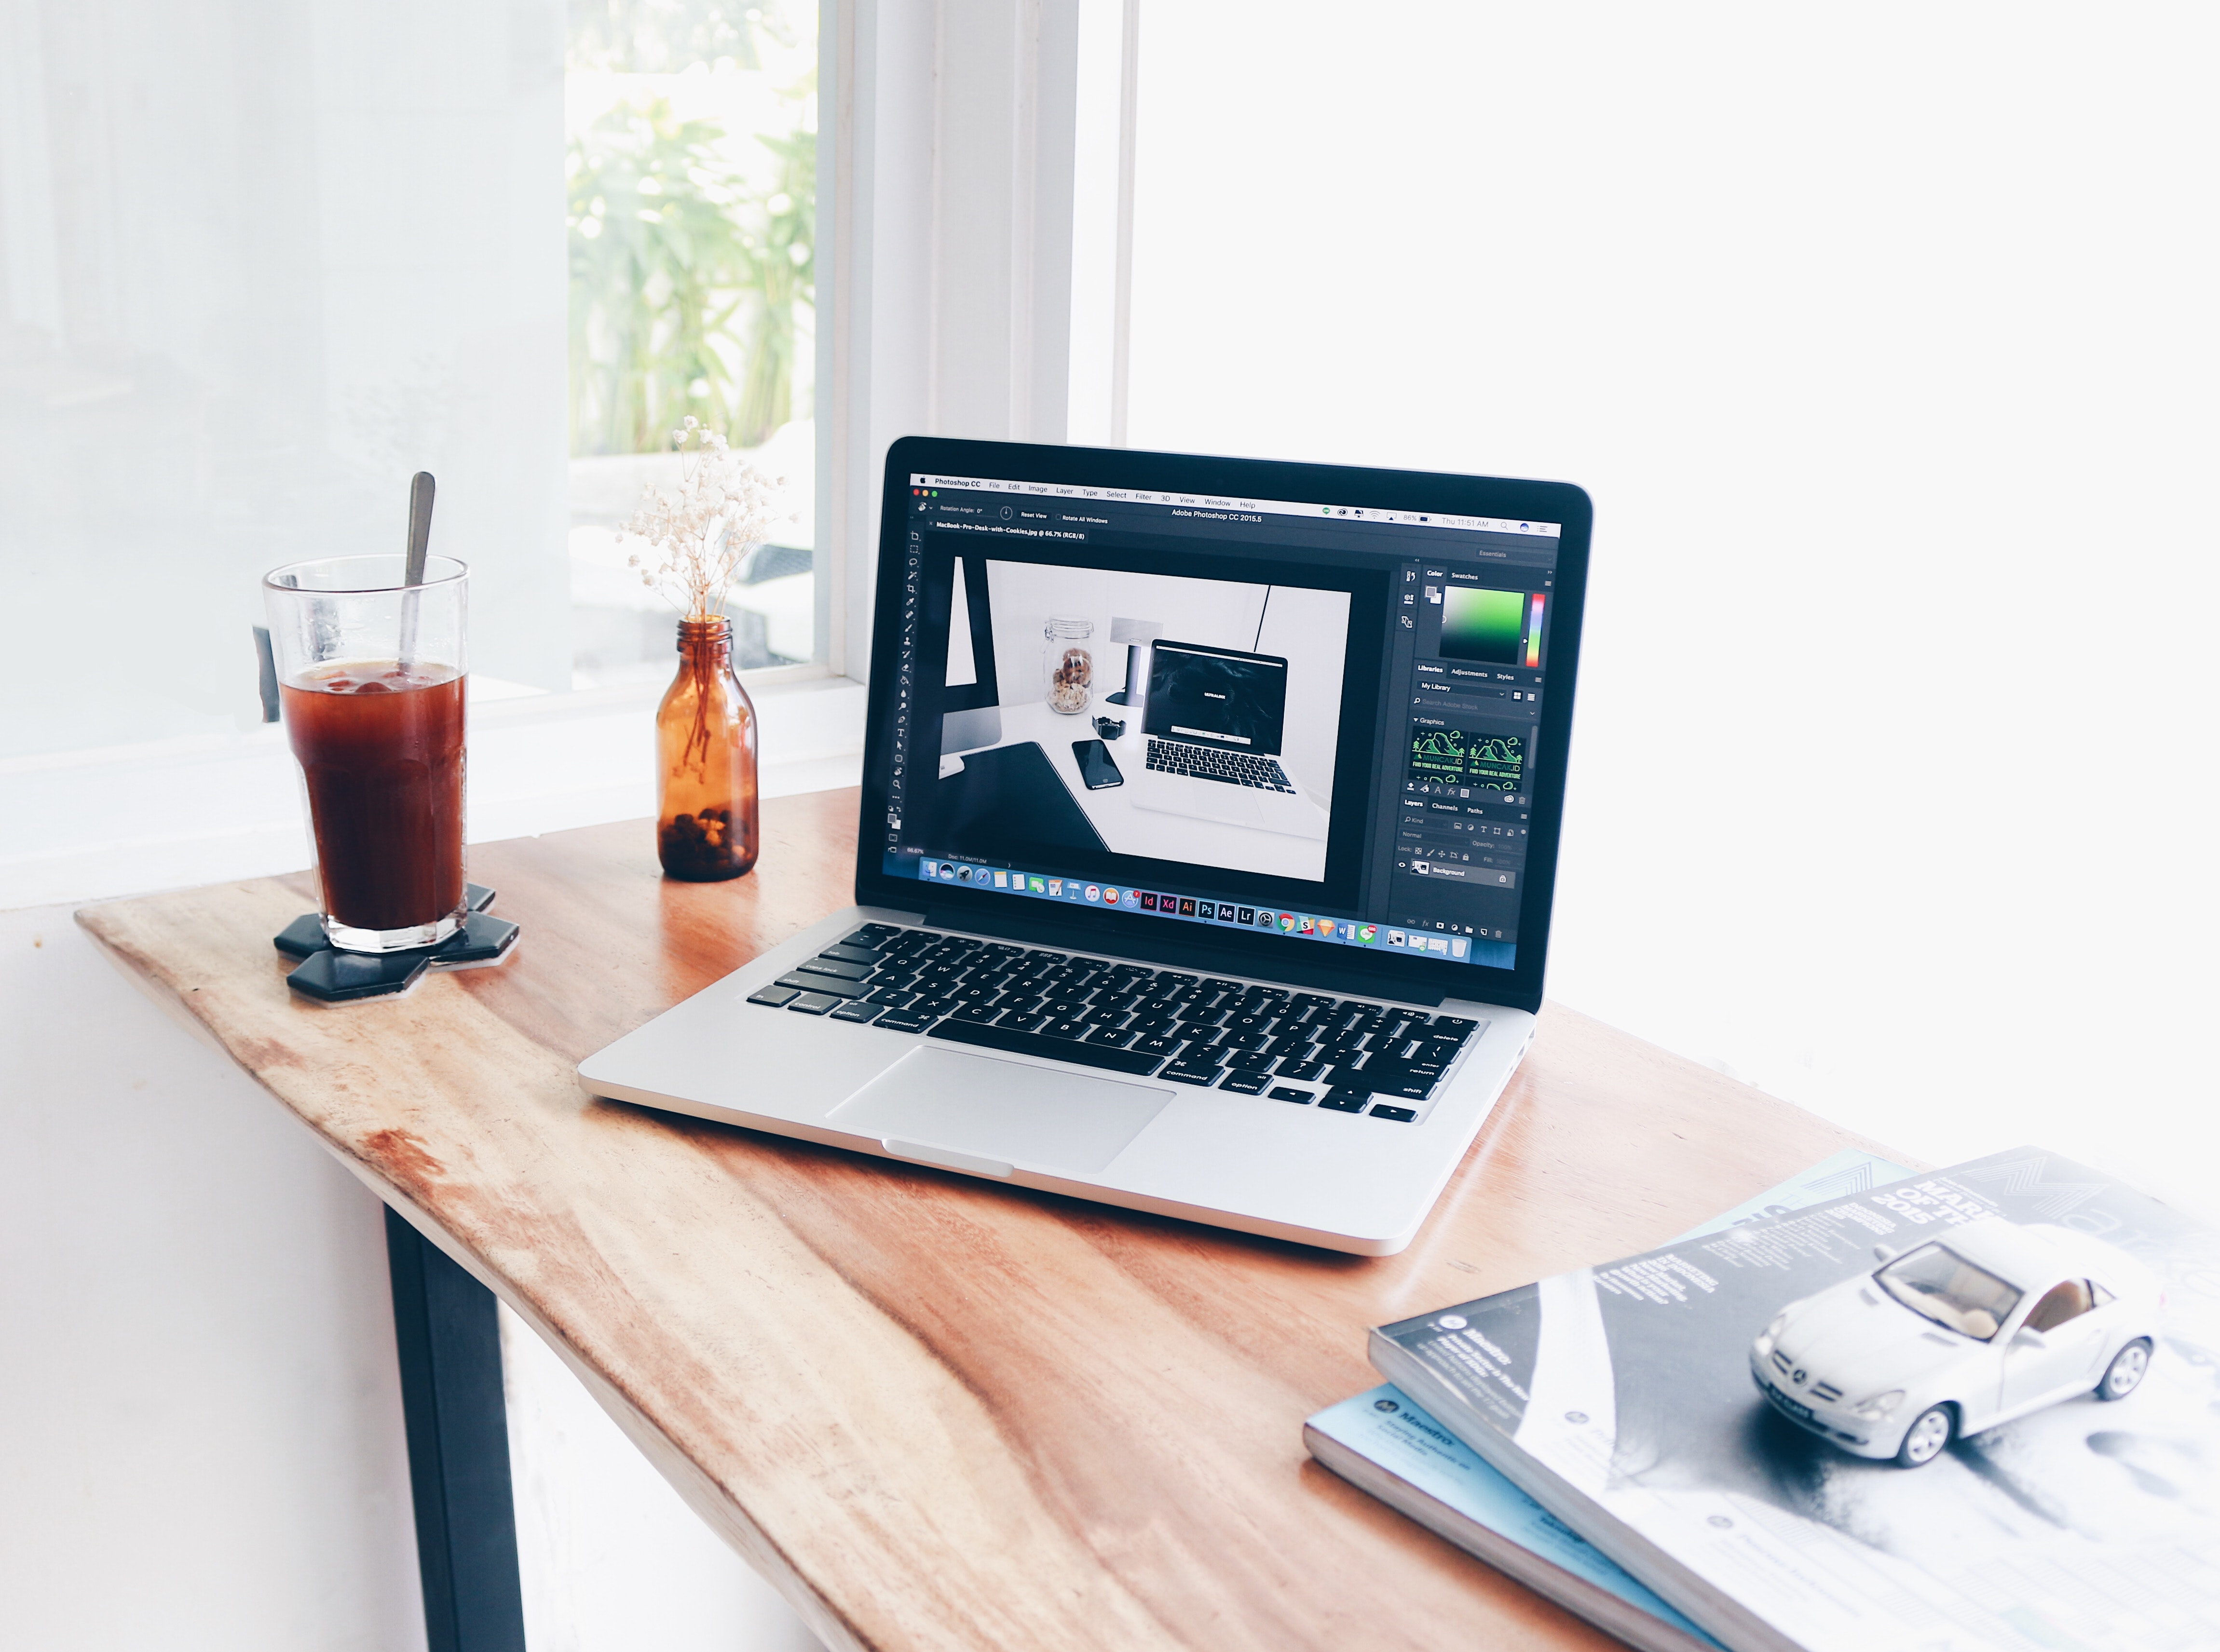 Causes of Macbook Screen Damage